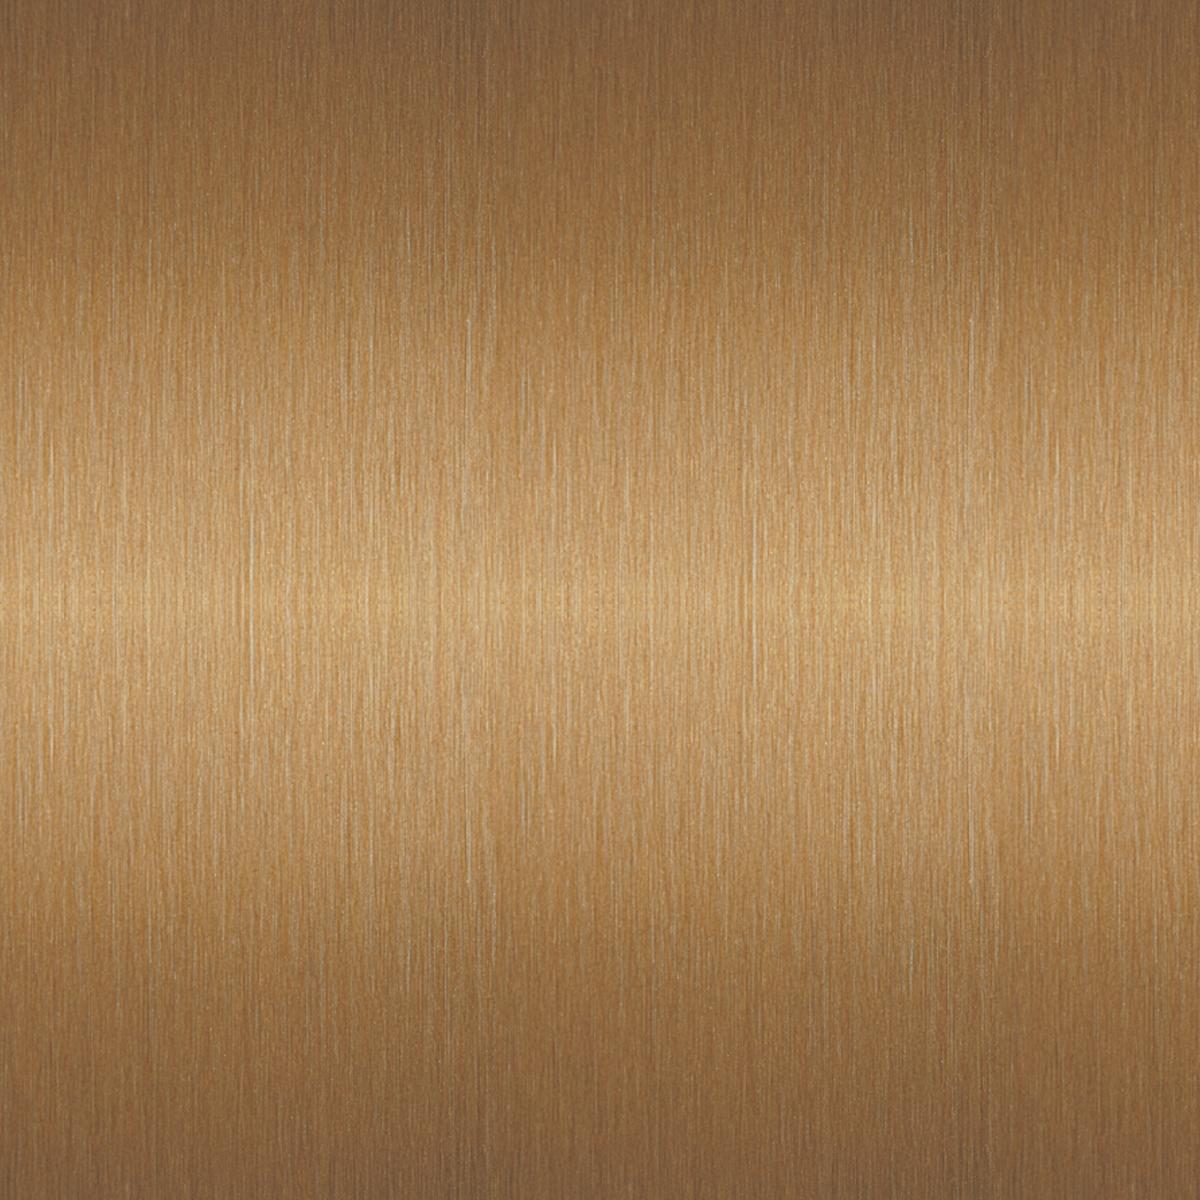 M2126 Brushed Brasstoned Aluminium Laminate Countertops